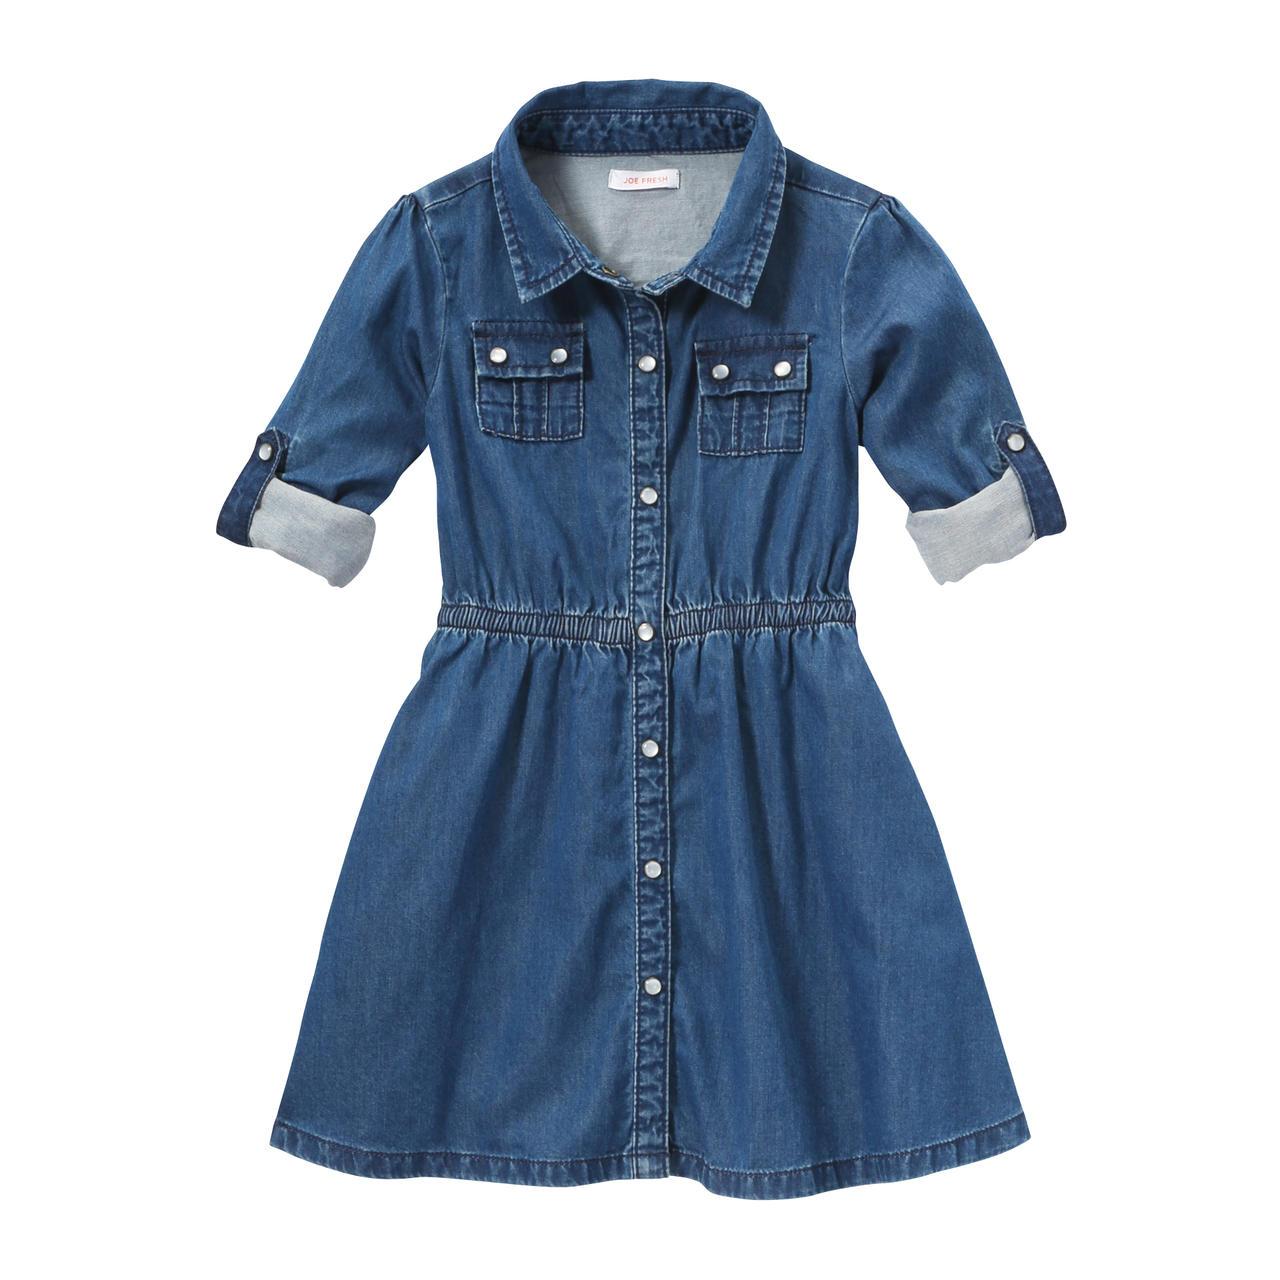 Toddler Girls&39 Denim Shirt Dress in Blue from Joe Fresh